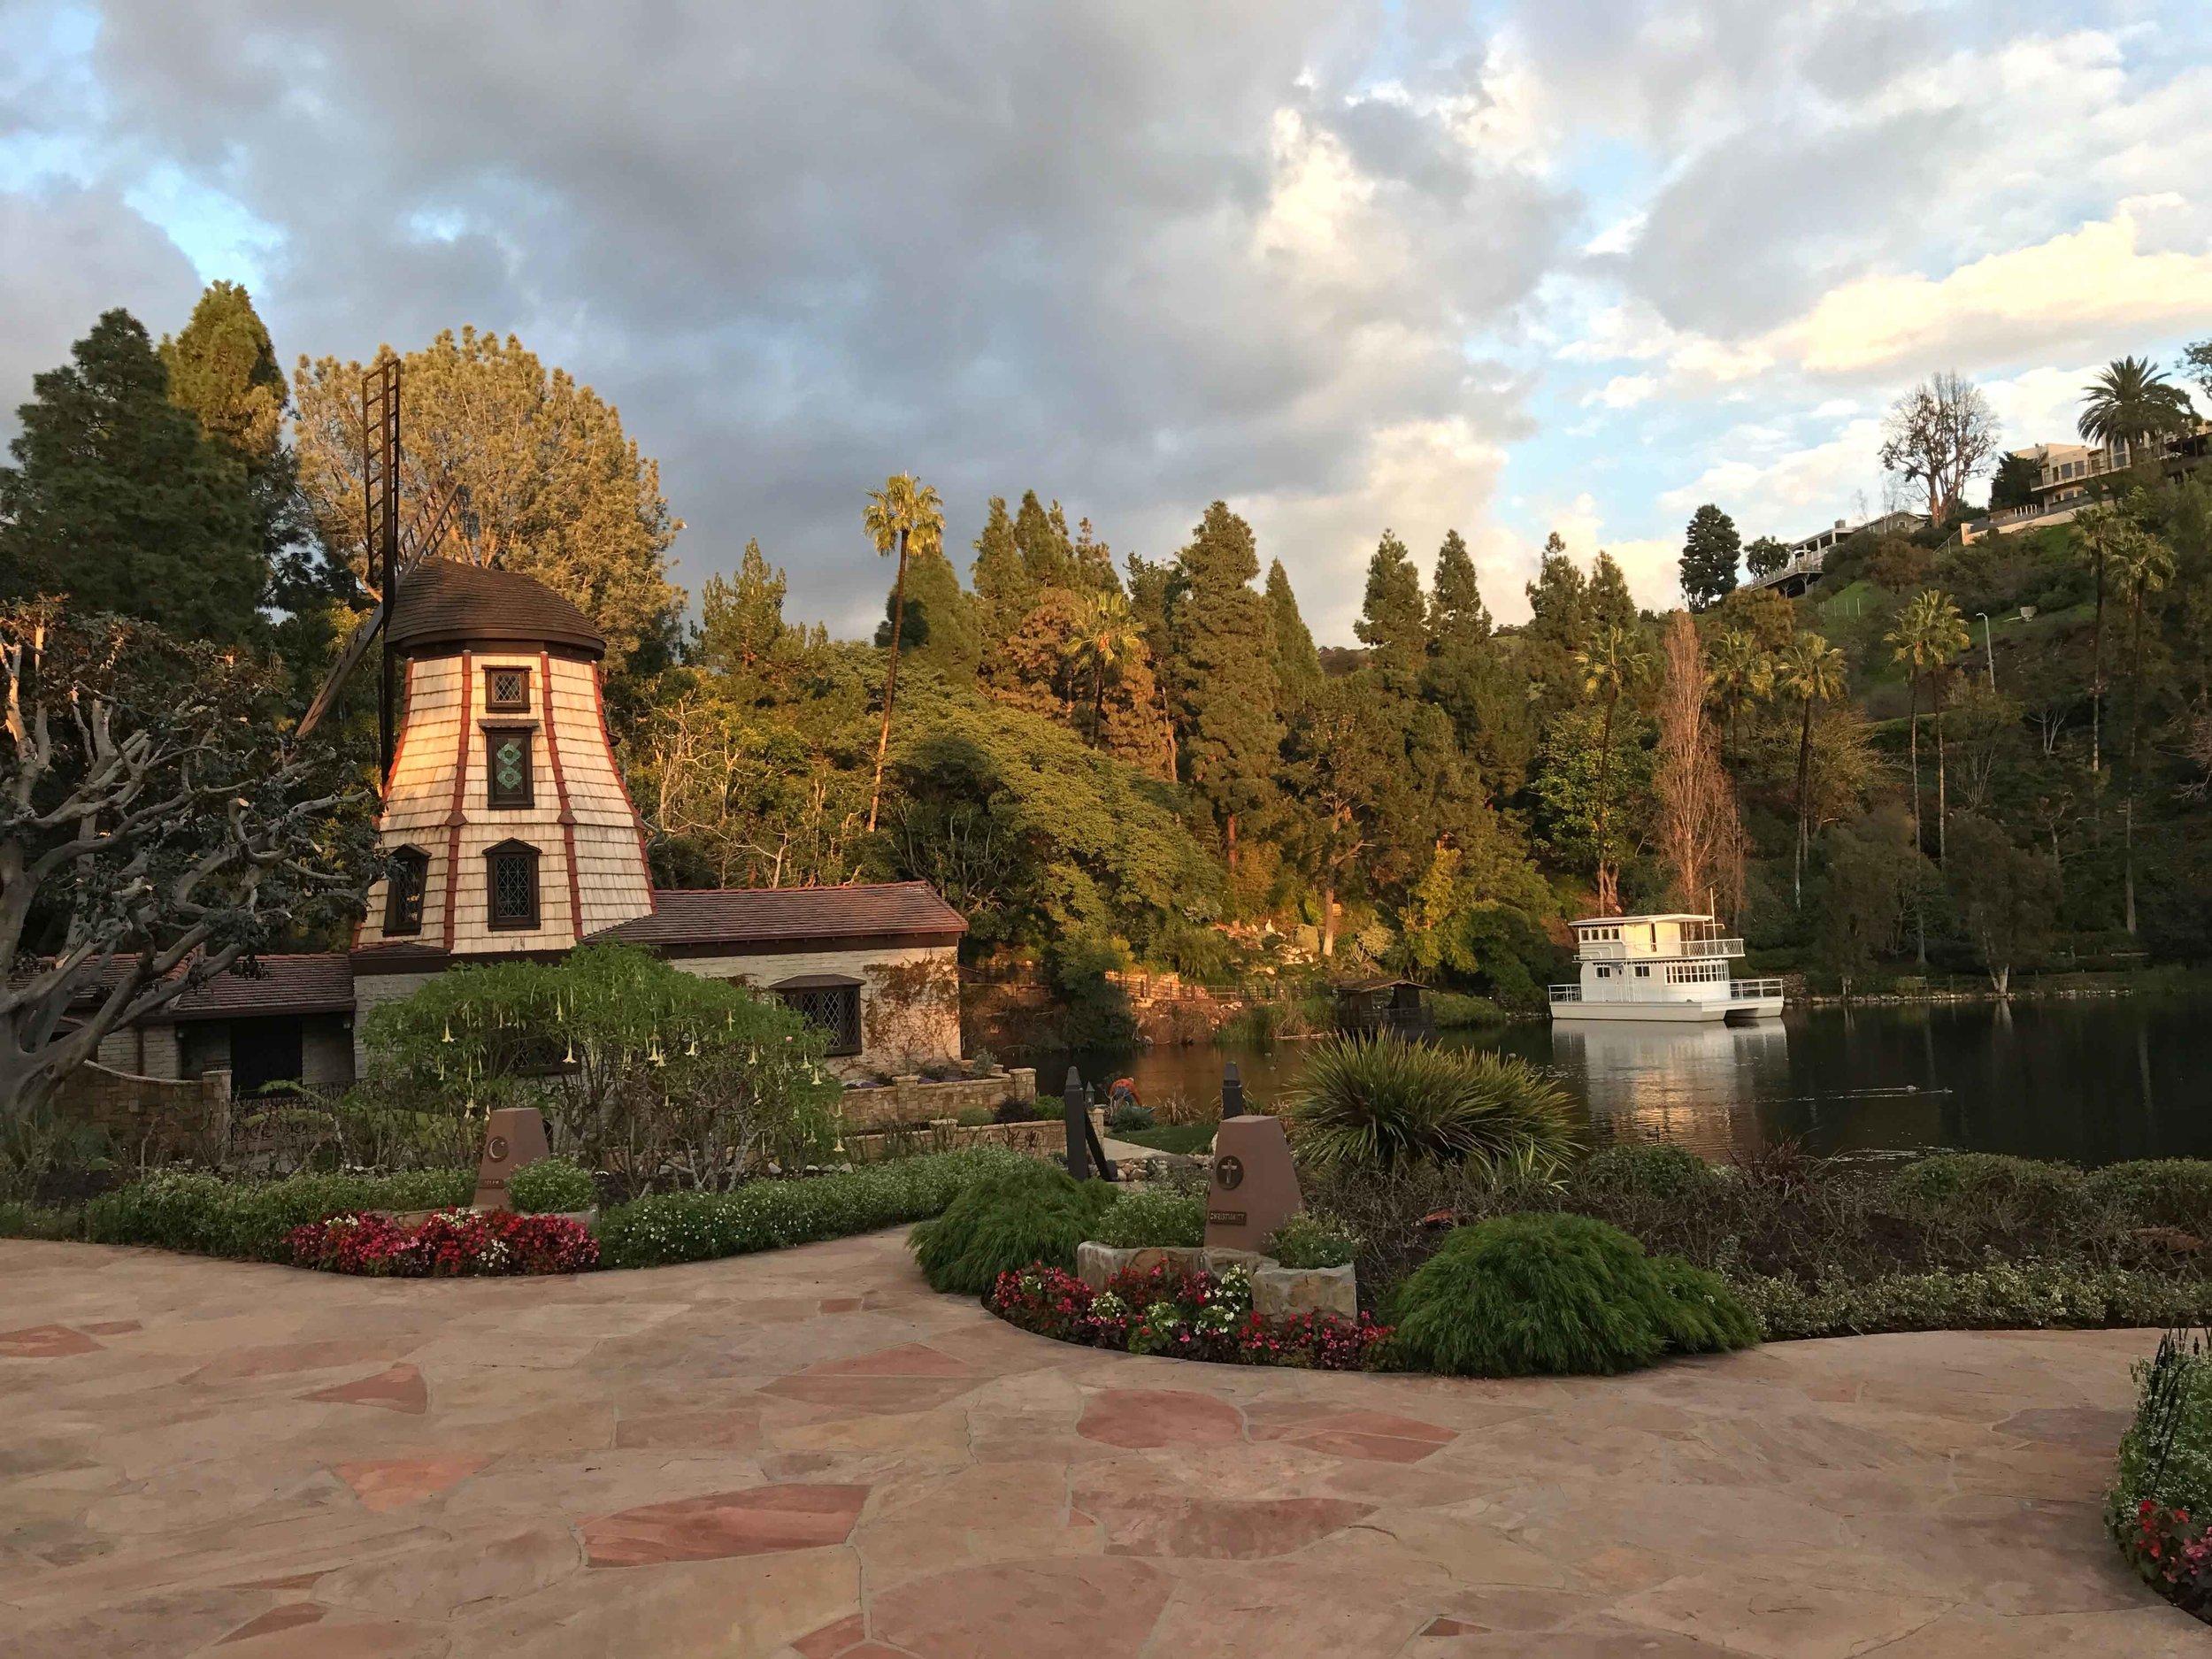 SRF Lake Shrine meditation gardens, Pacific Palisades. Image©thingstodot.com